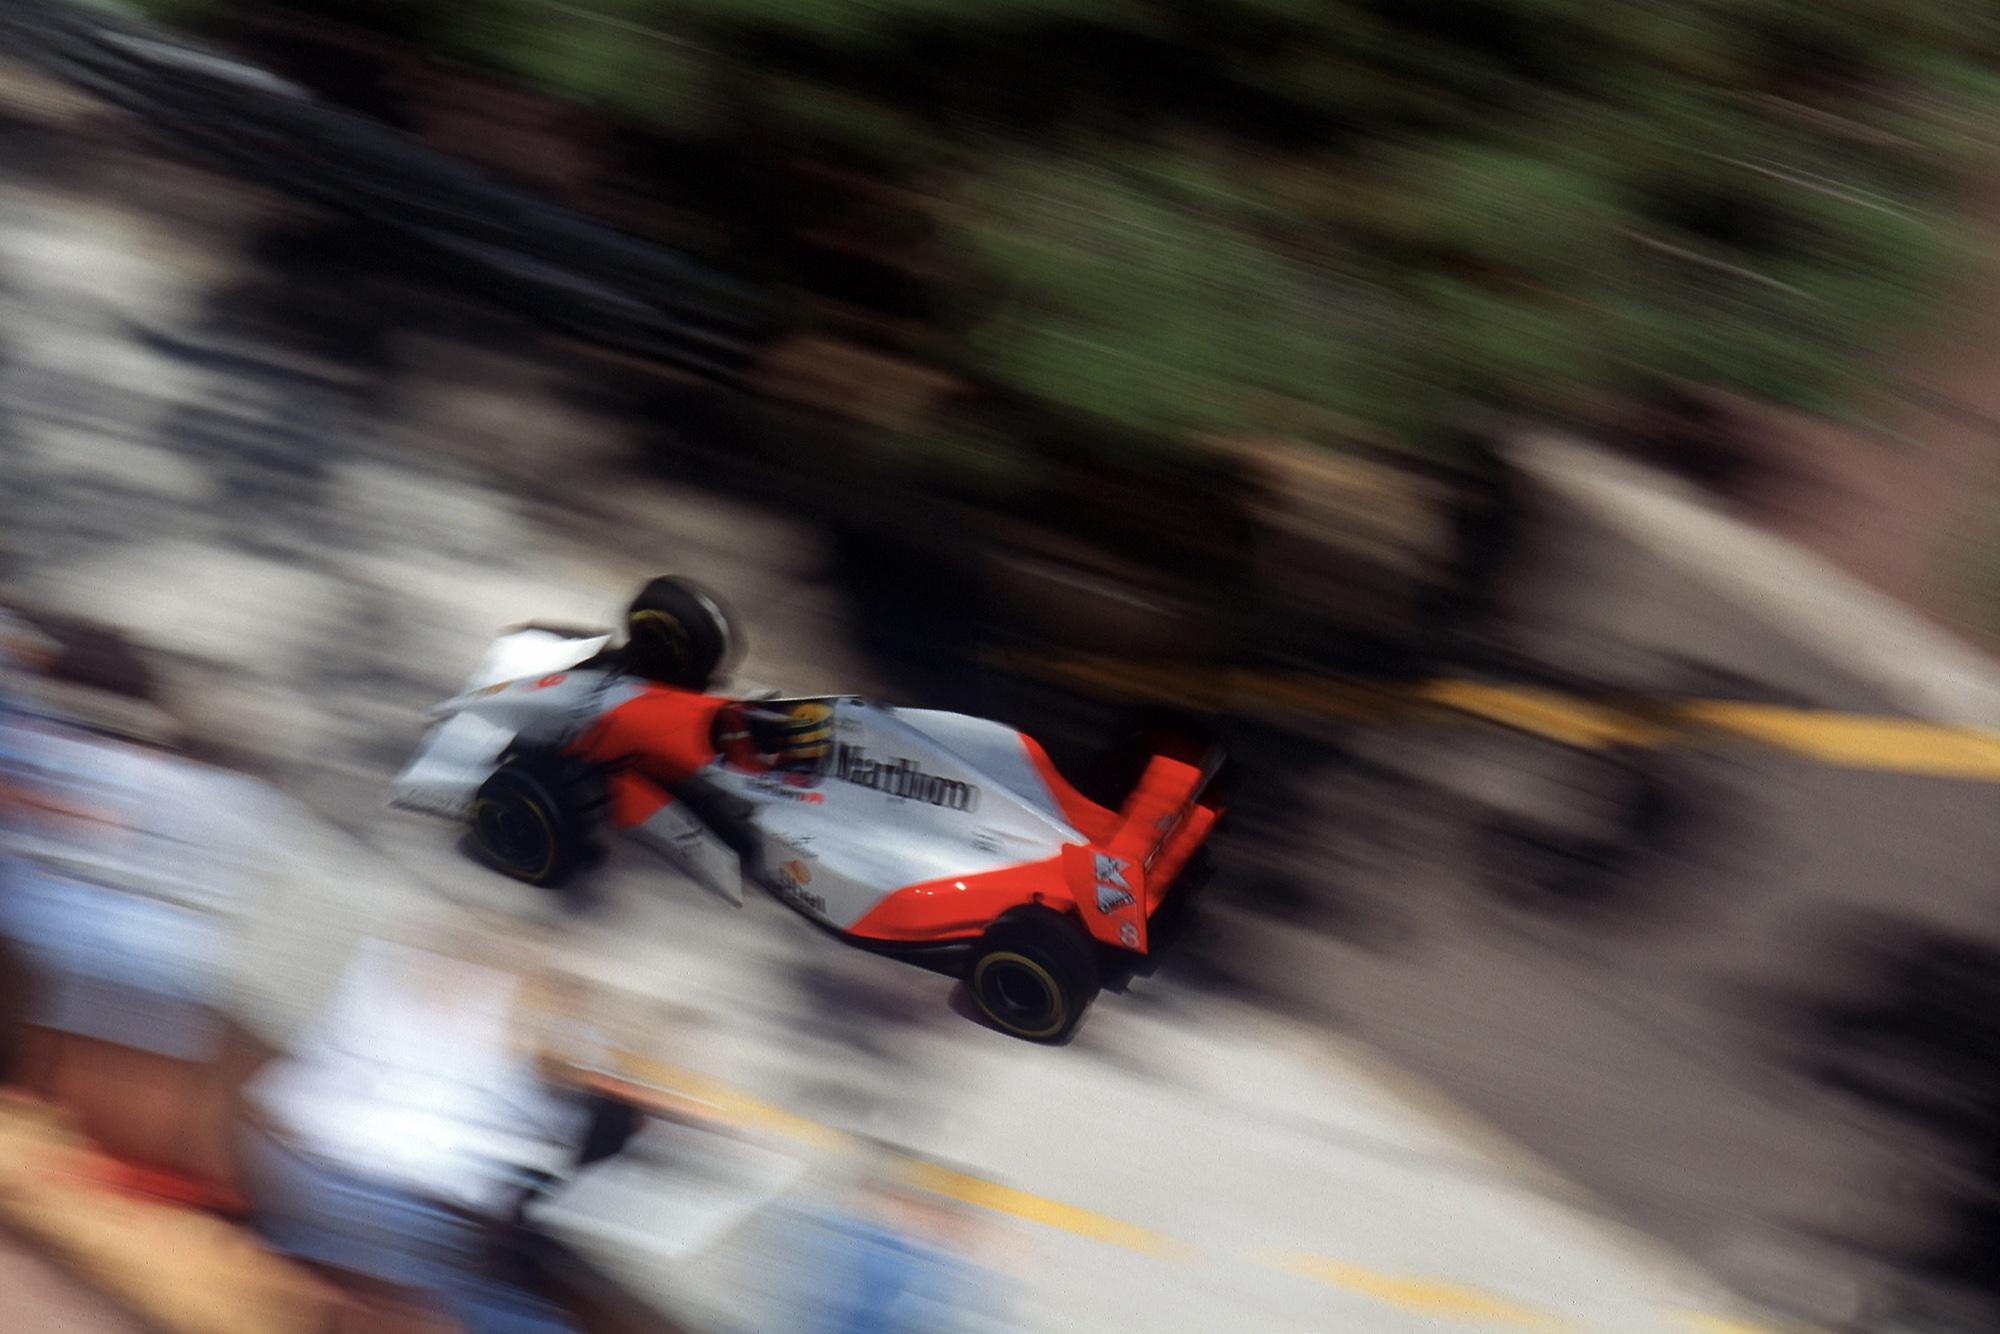 Overhead shot of Ayrton Senna at the 1993 Monaco Grand Prix